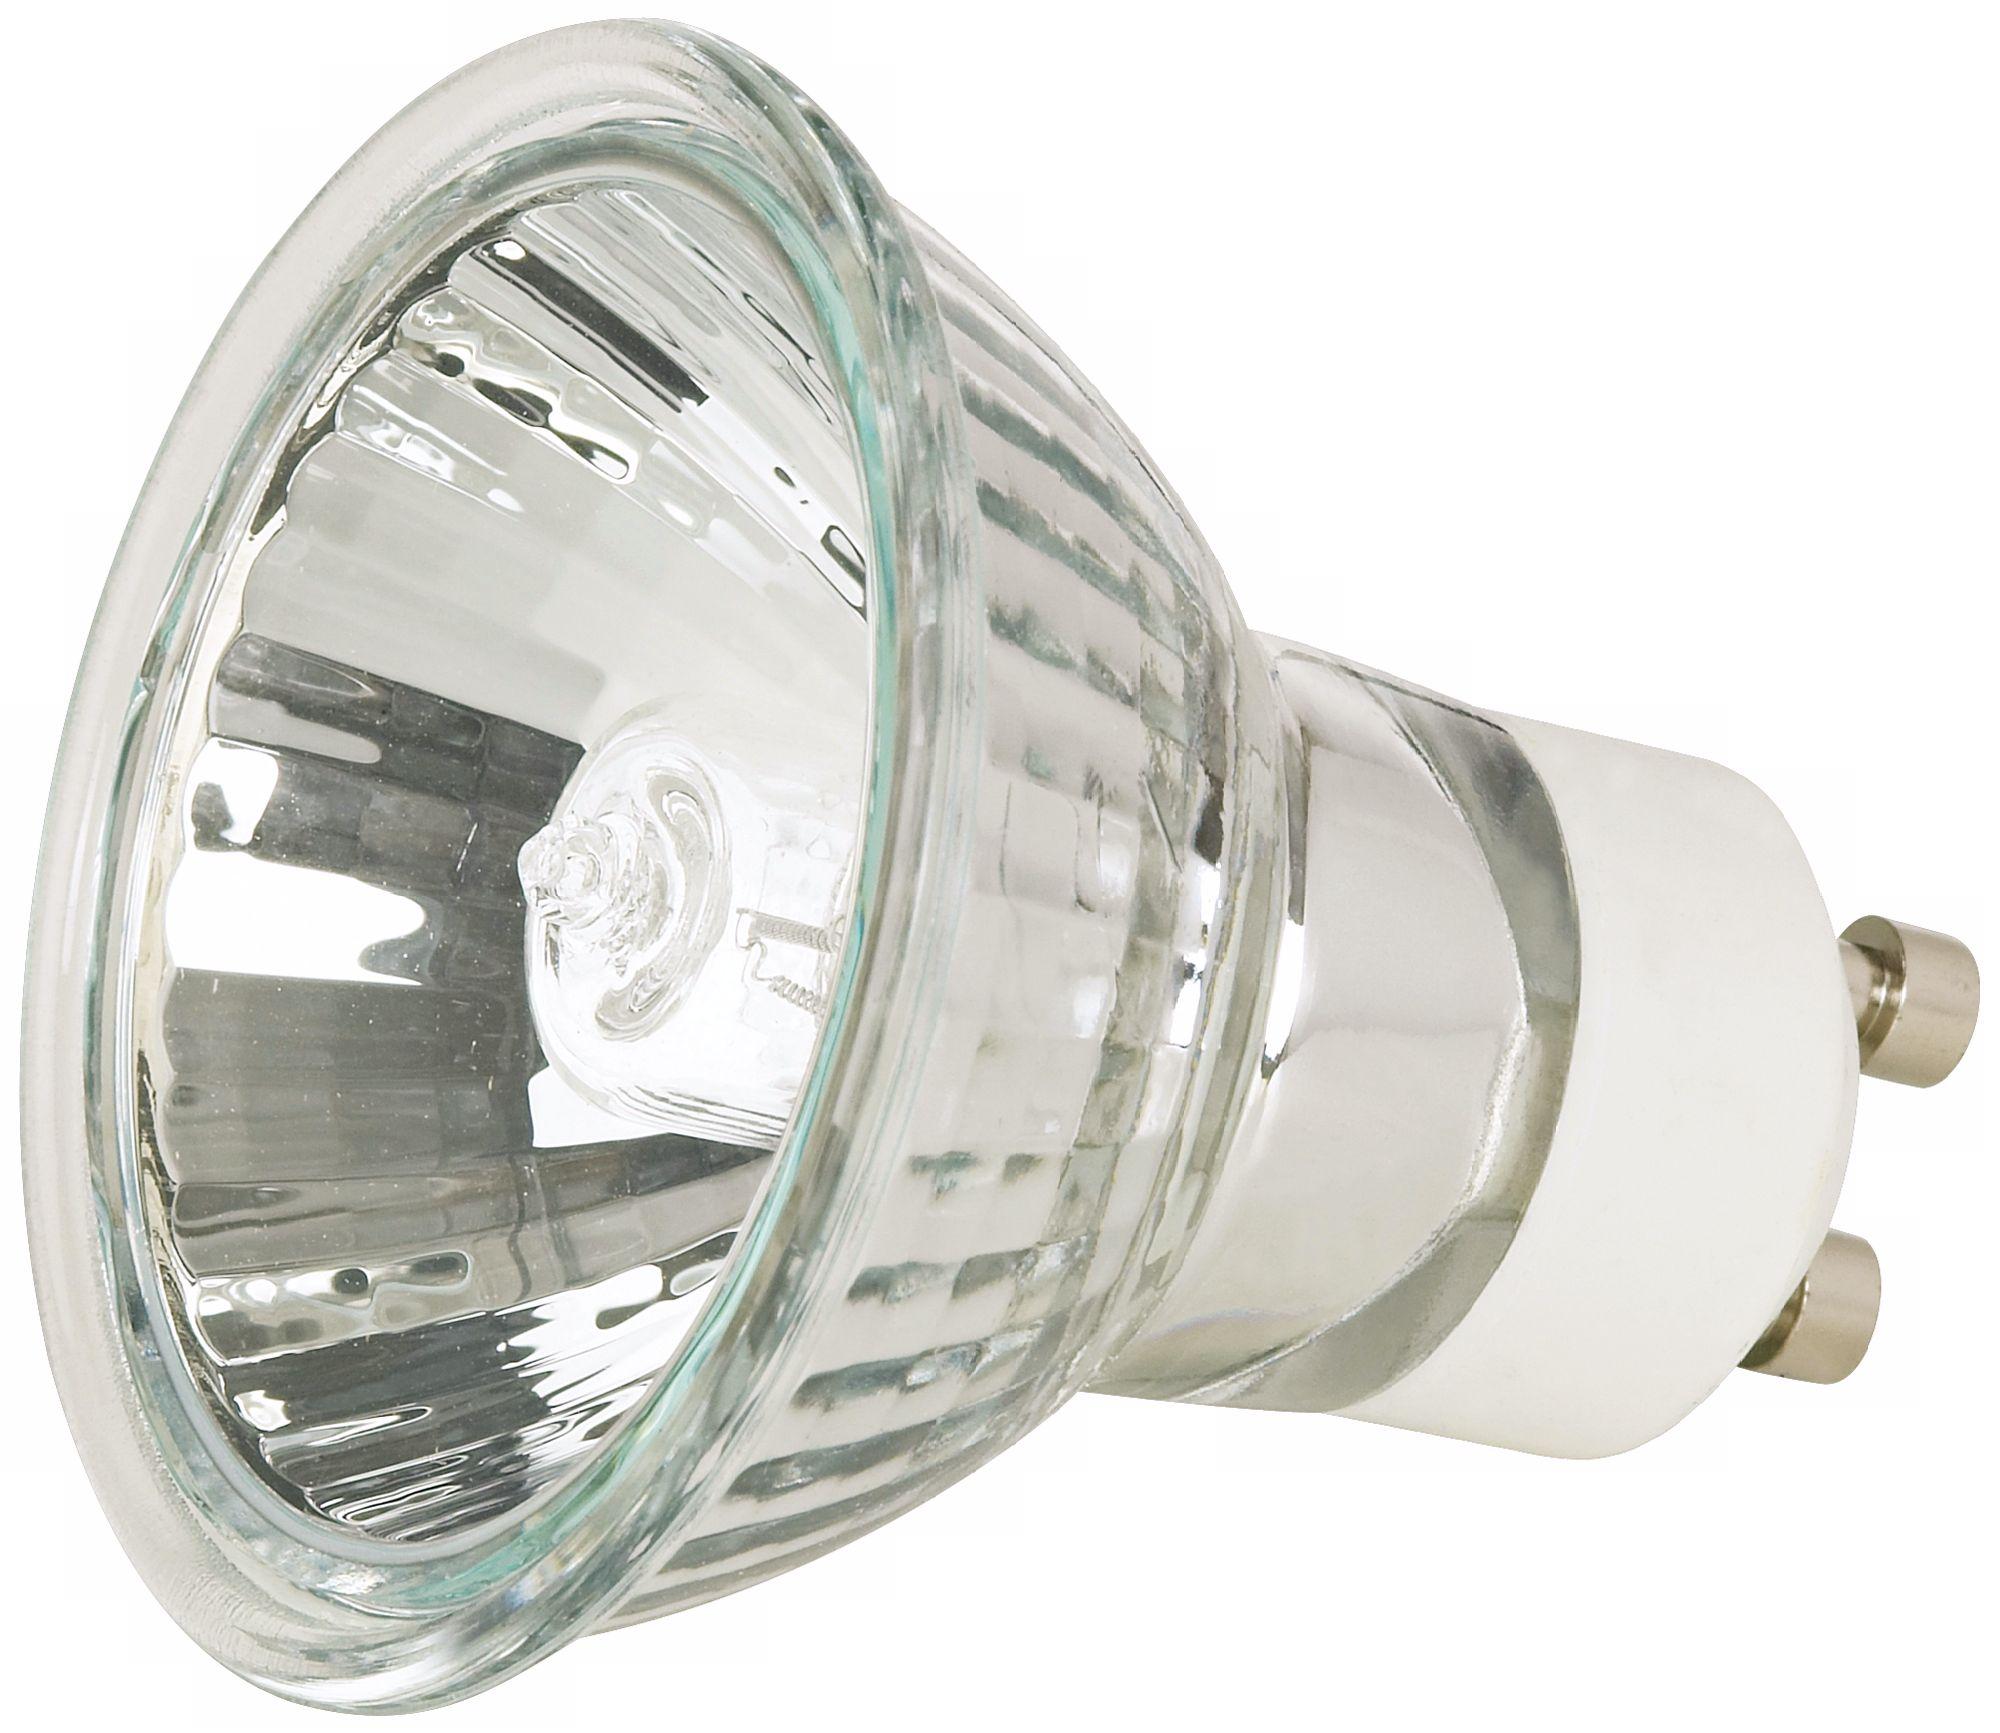 Tesler 50 Watt GU10 MR16 Halogen Light Bulb  sc 1 st  L&s Plus & Tesler 50 Watt GU10 MR16 Halogen Light Bulb - #01771 | Lamps Plus azcodes.com